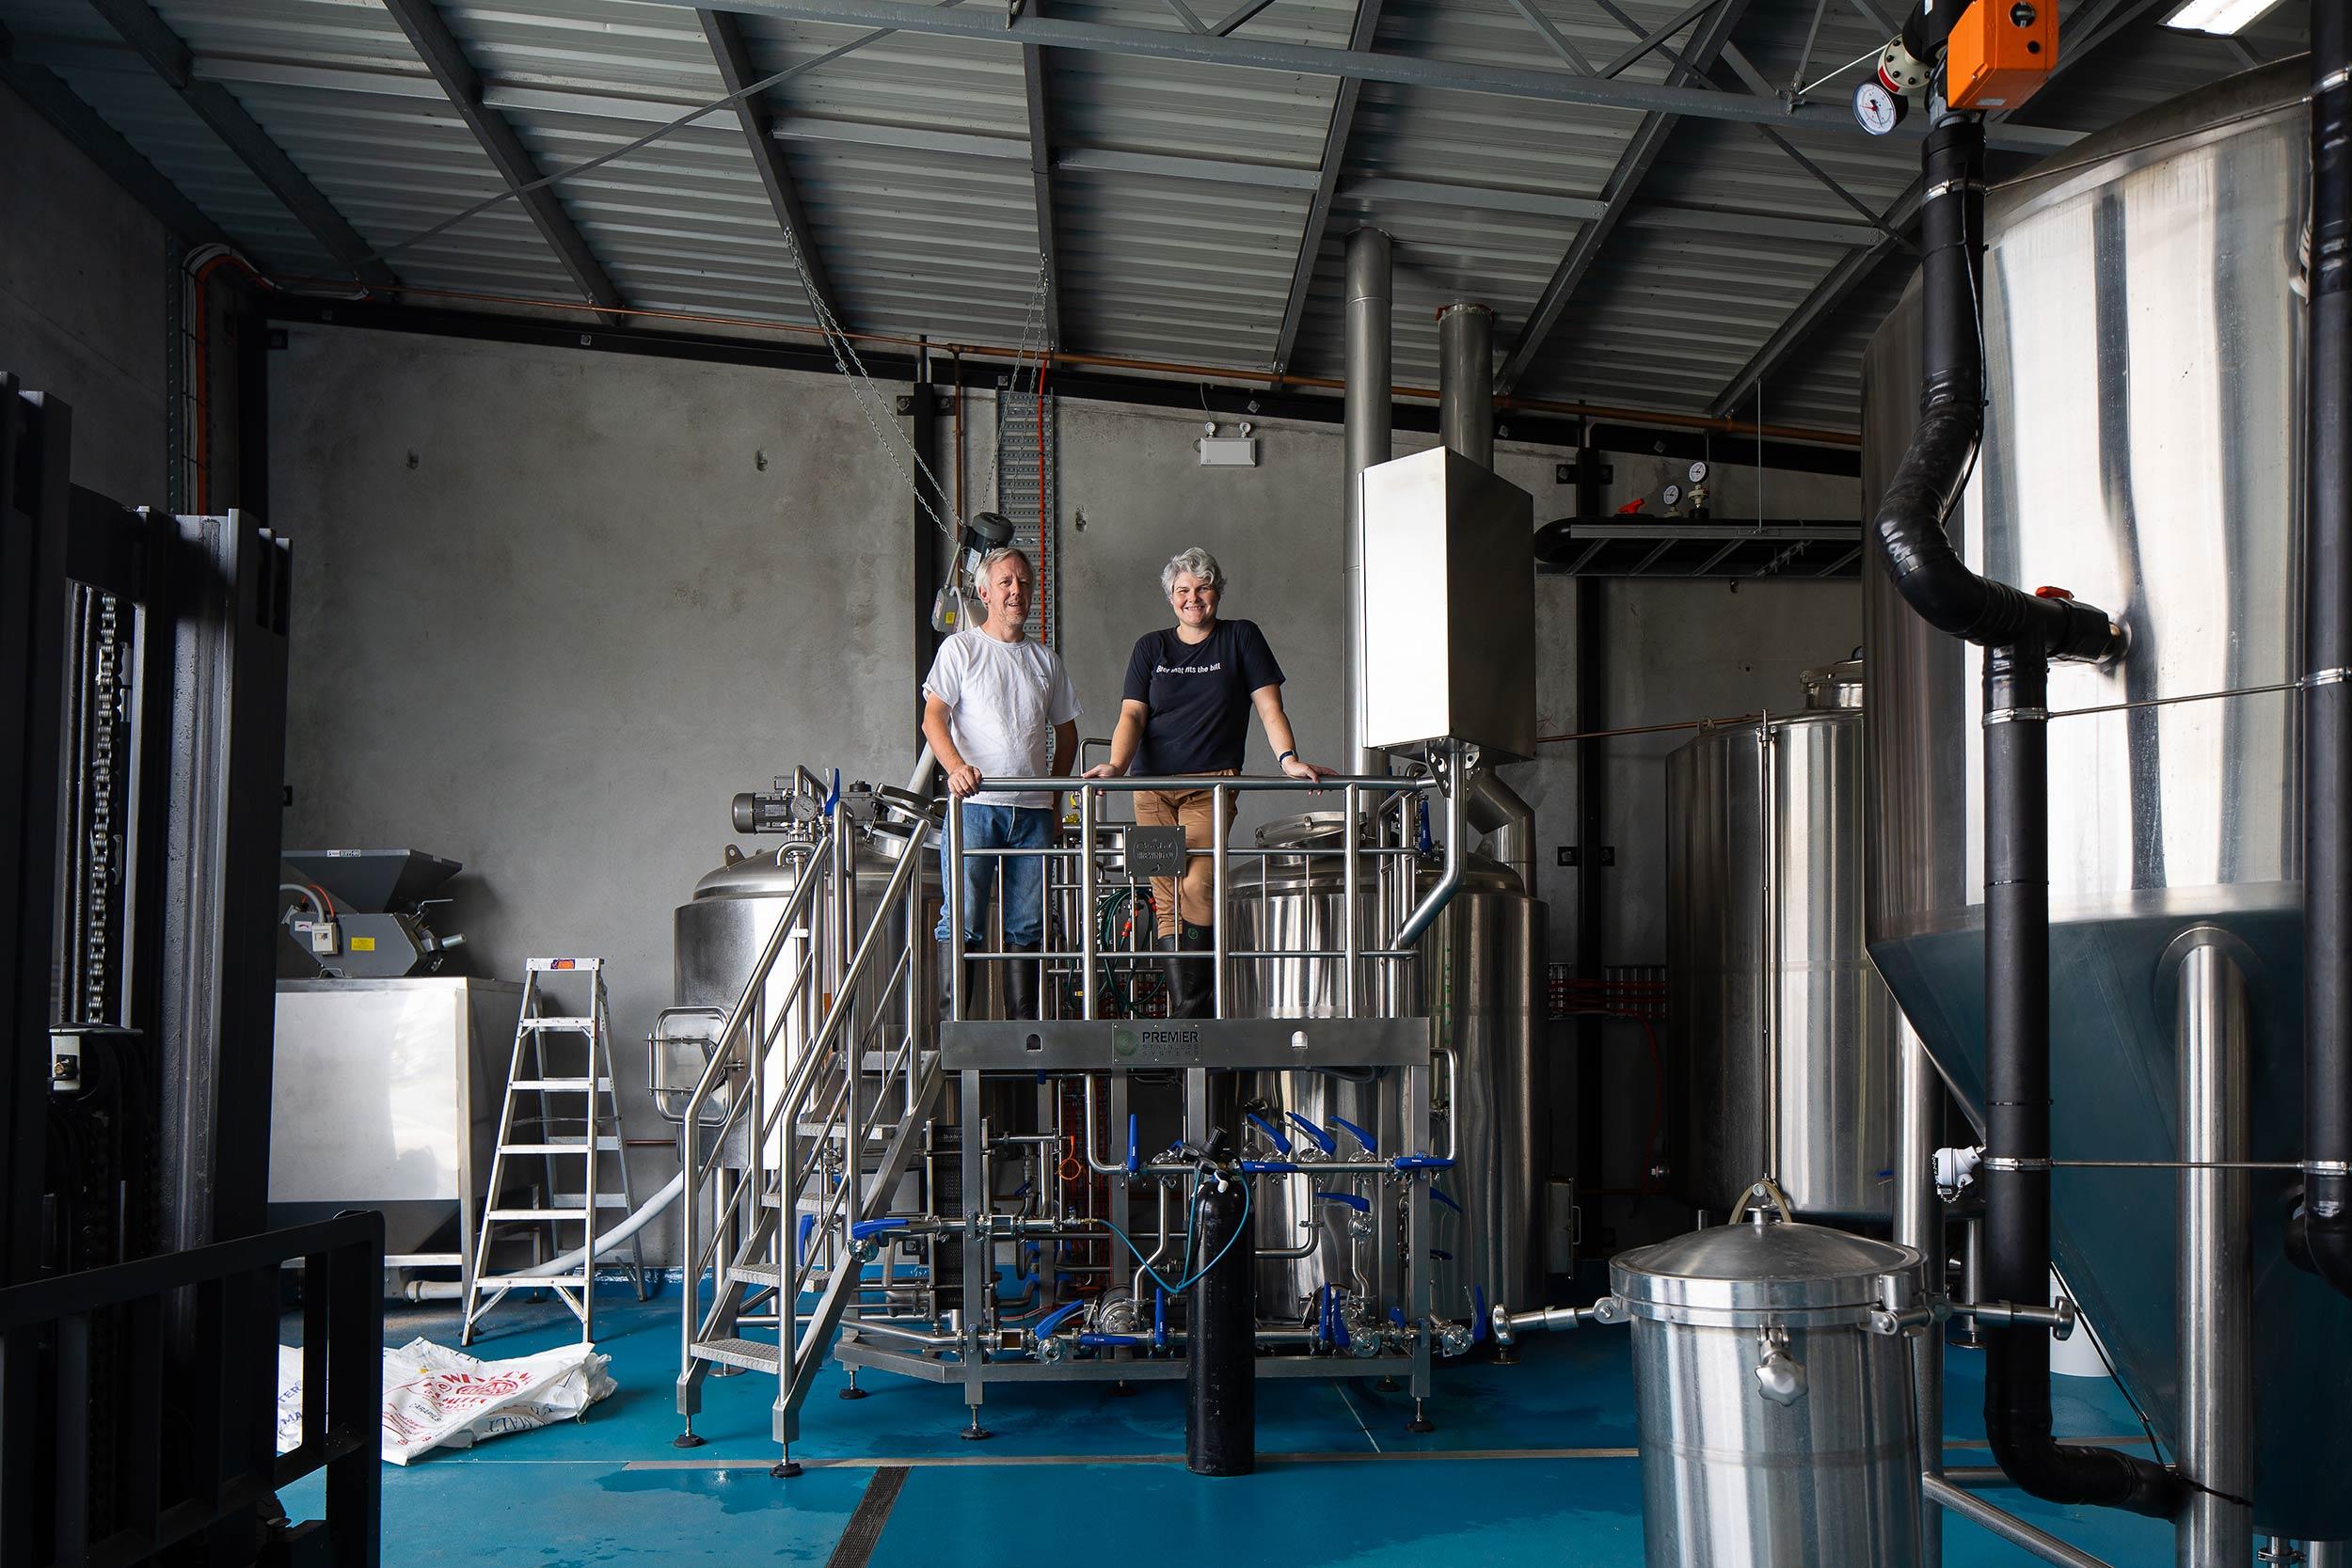 glft-coastal-brewing-helen-david.jpg